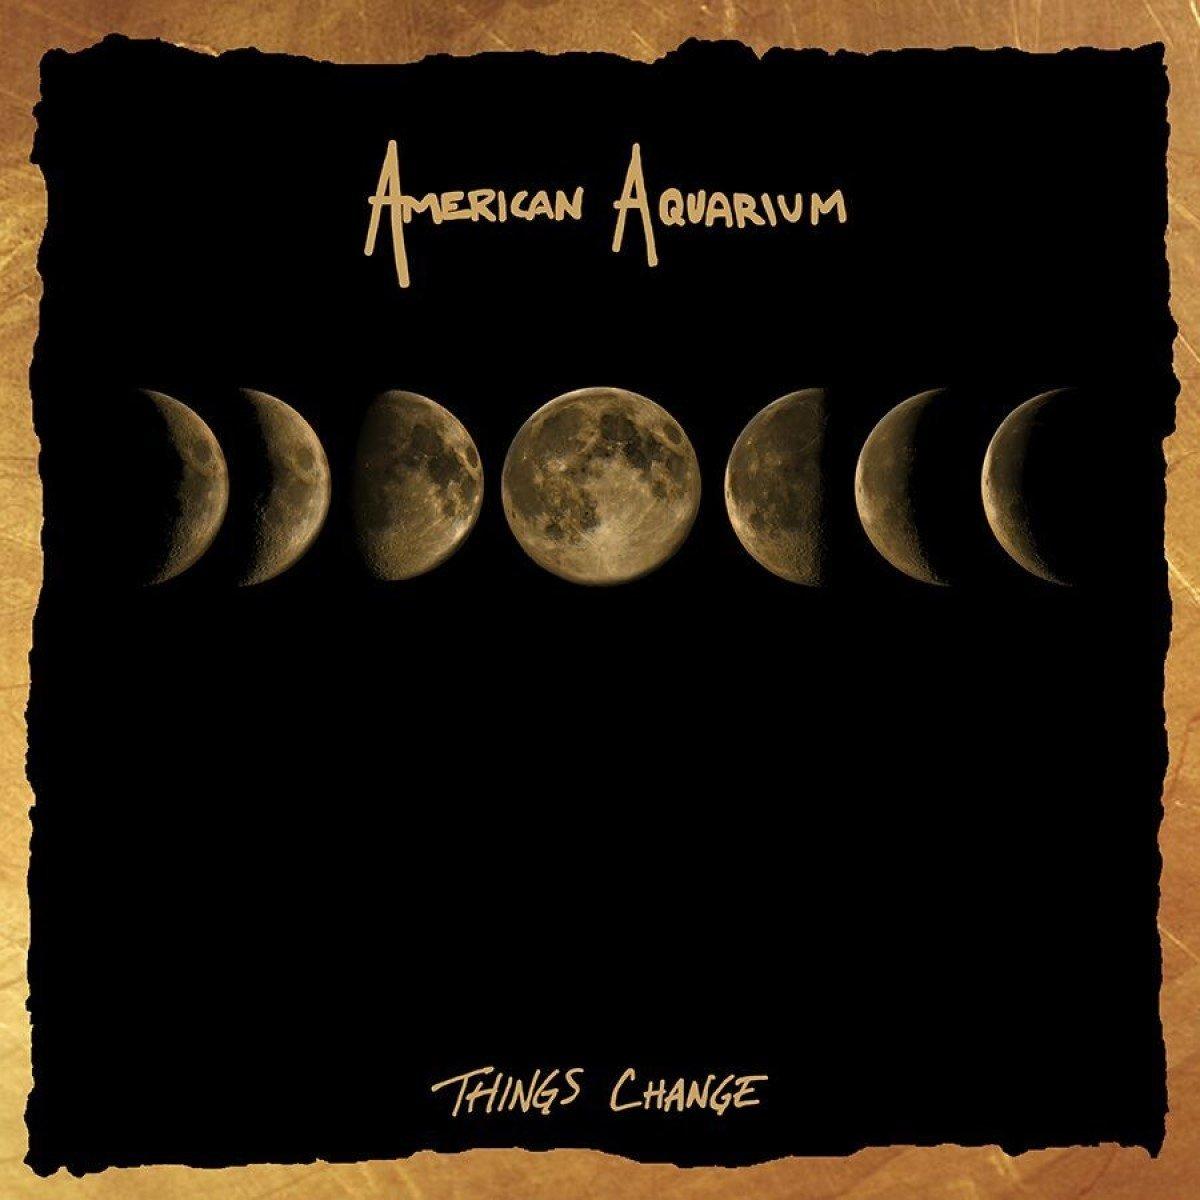 Vinilo : American Aquarium - Things Change (LP Vinyl)